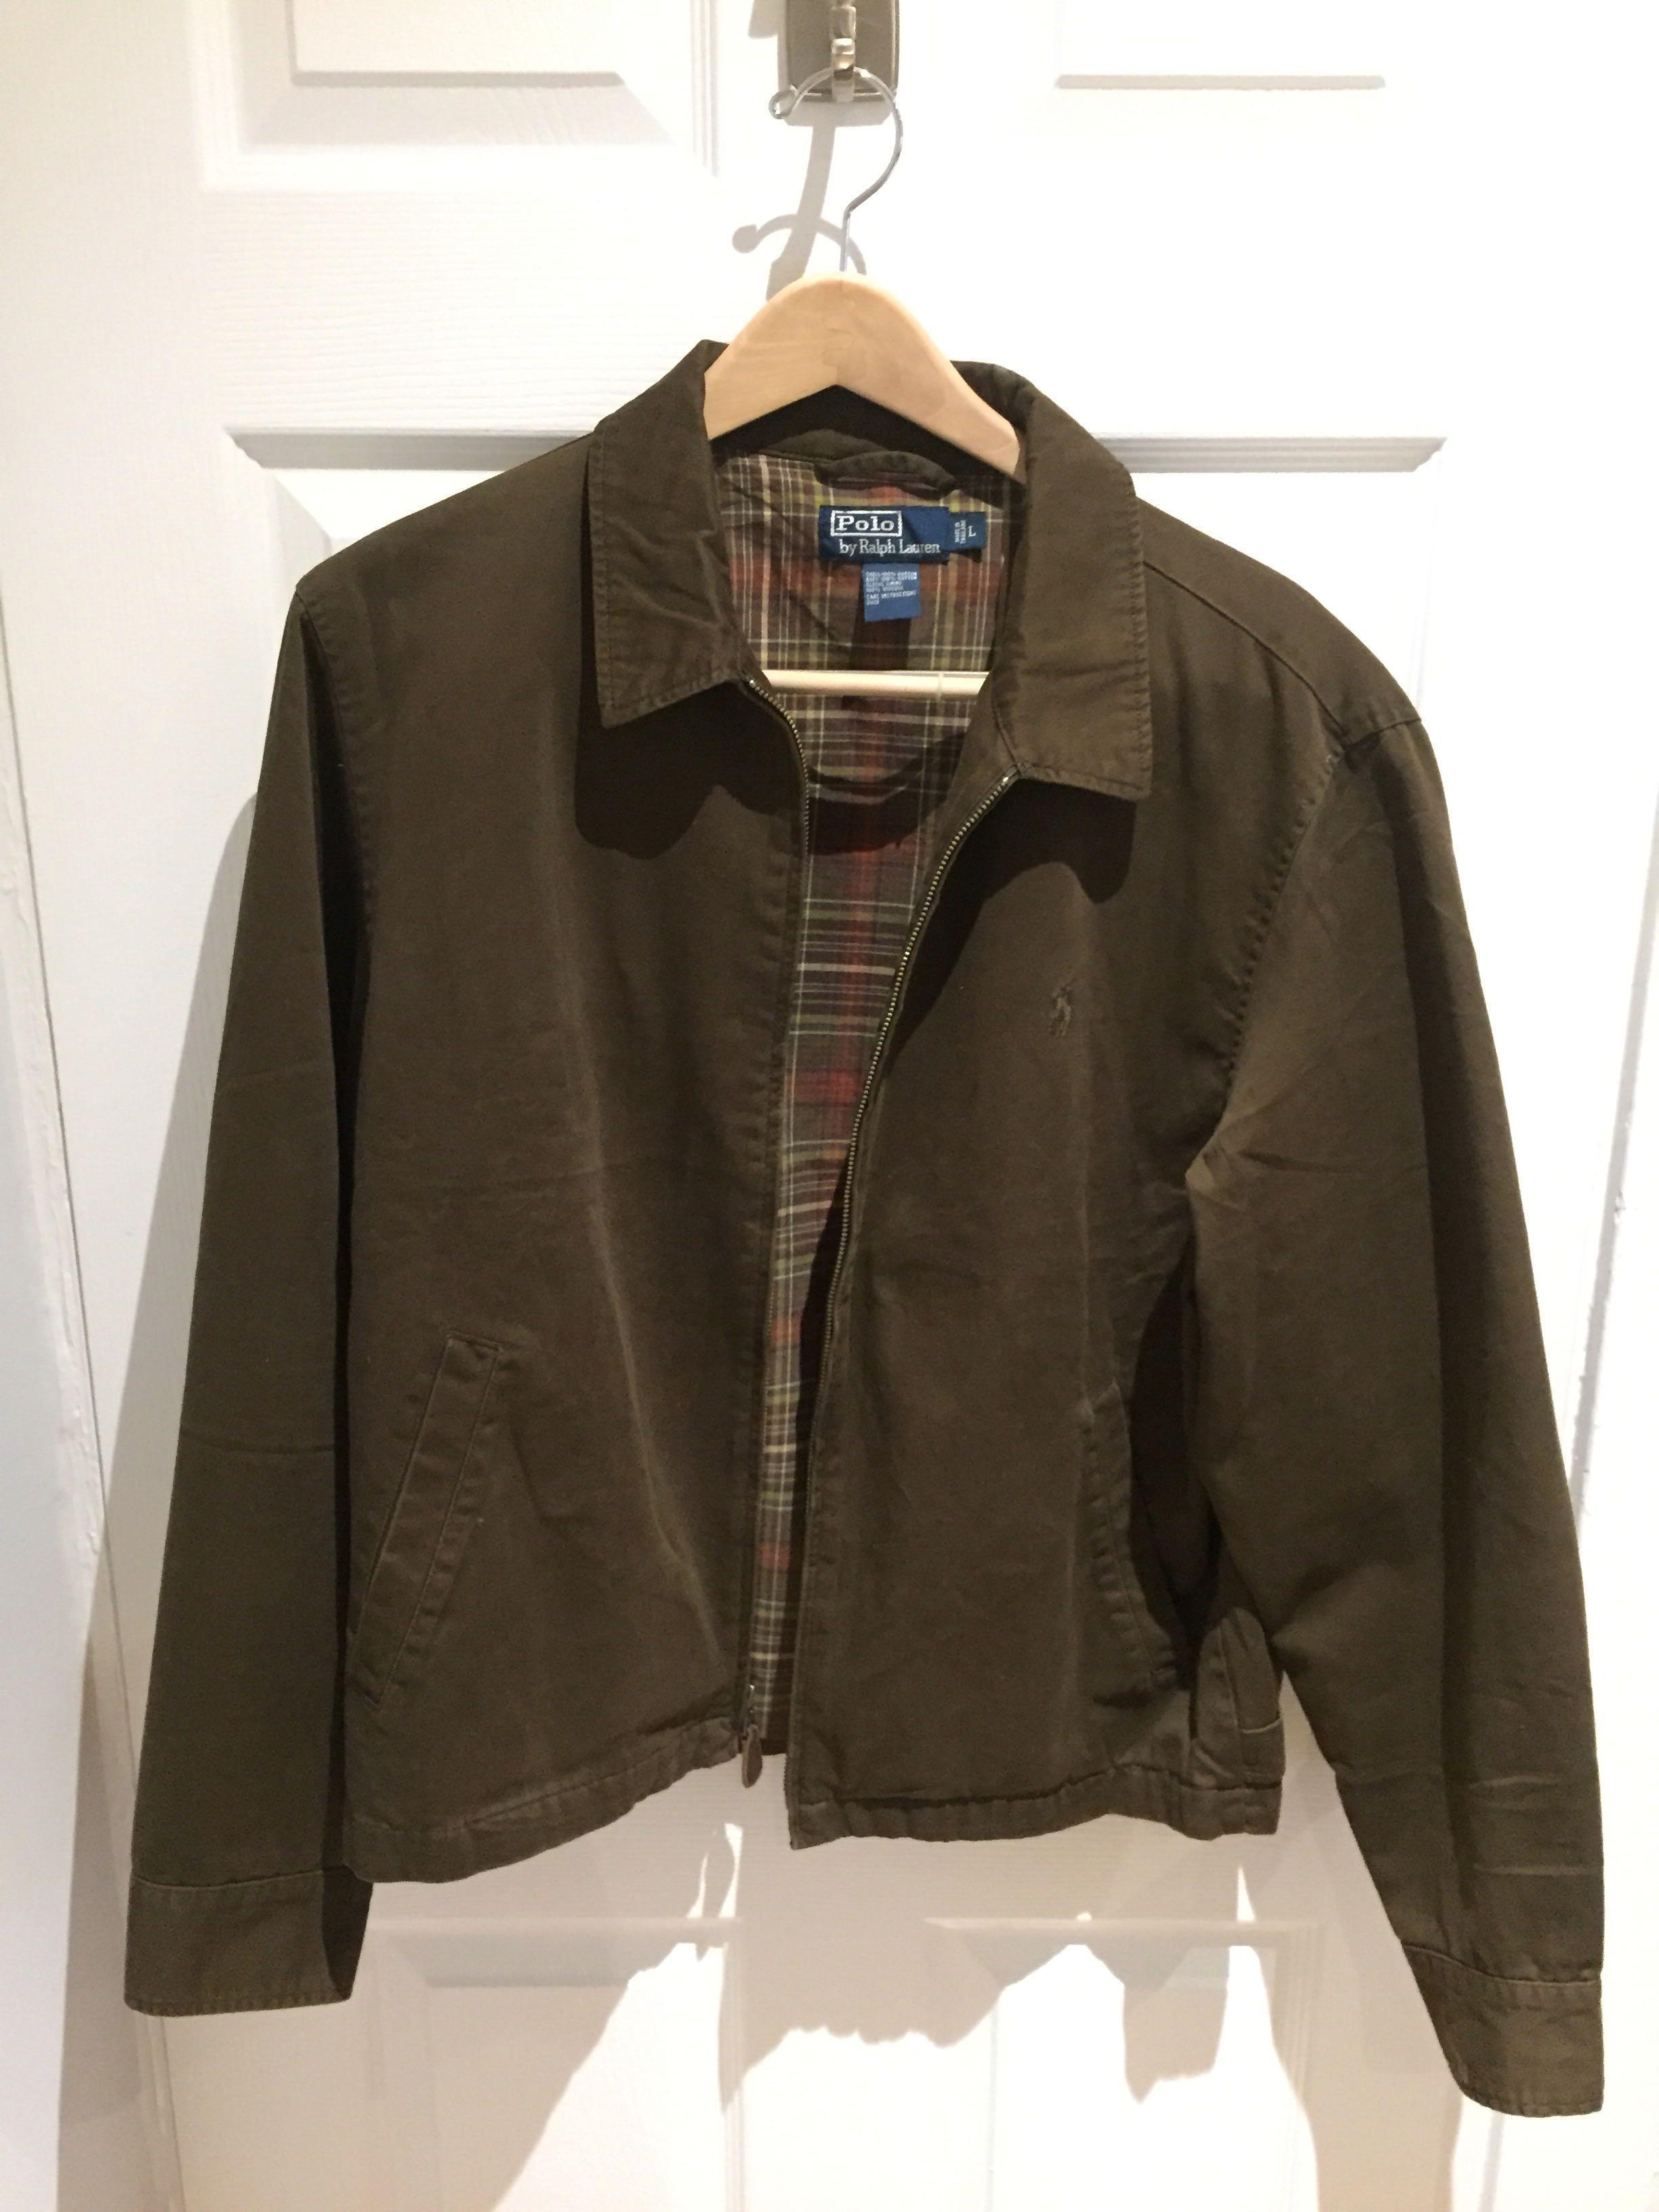 Polo Ralph Lauren Brown Zip-Up Jacket - Size: Large